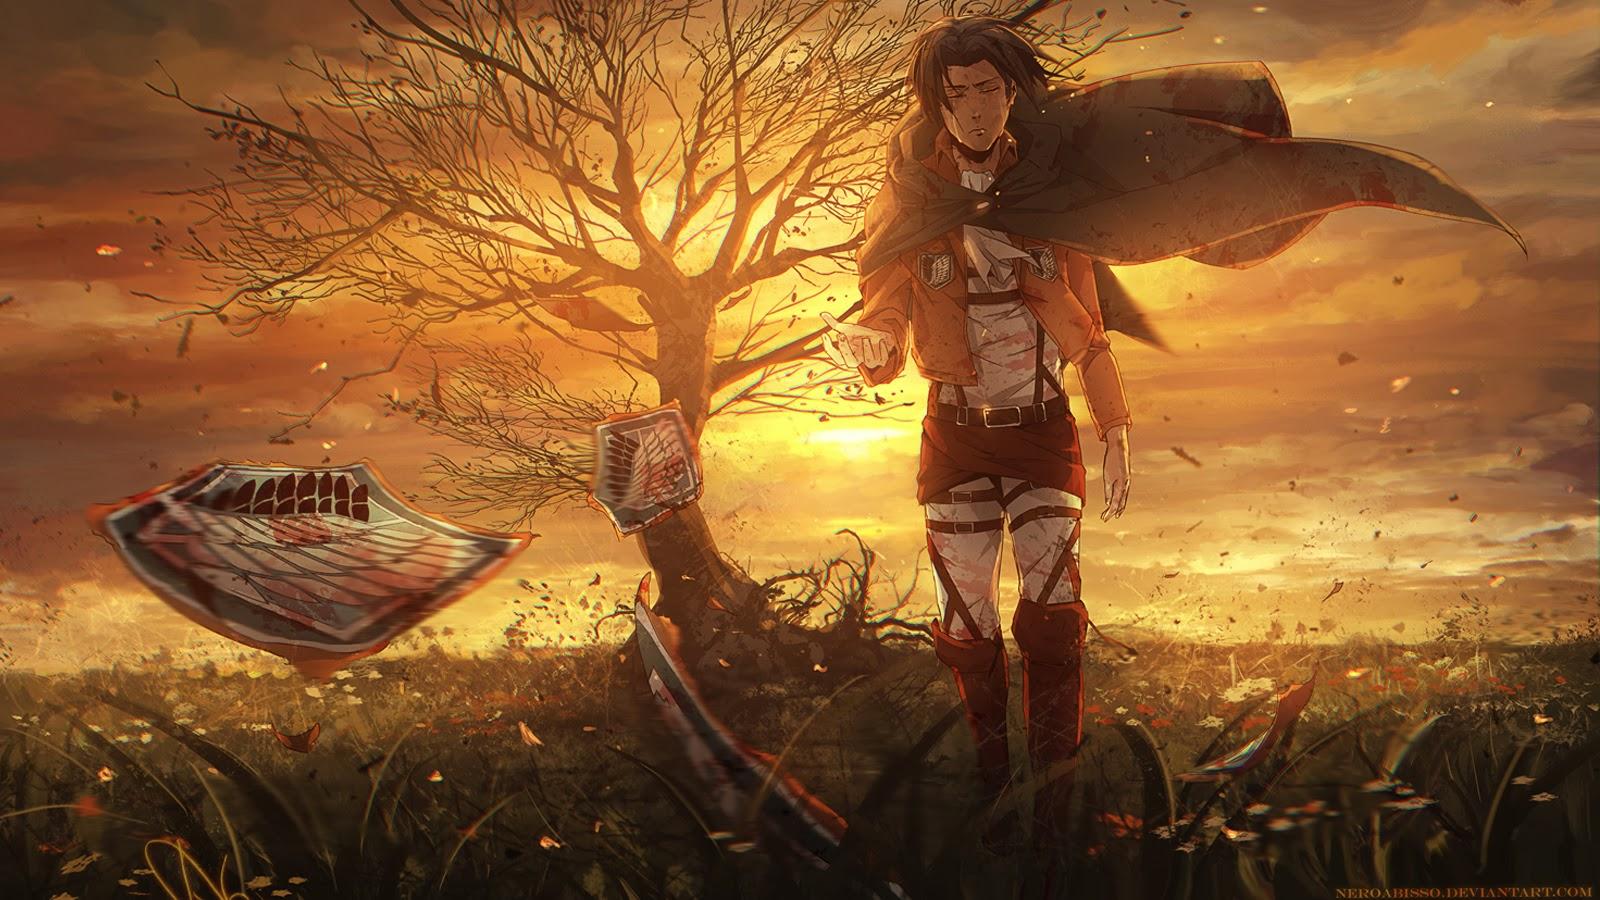 legion logo attack on titan shingeki no kyojin anime hd wallpaper 1600x900